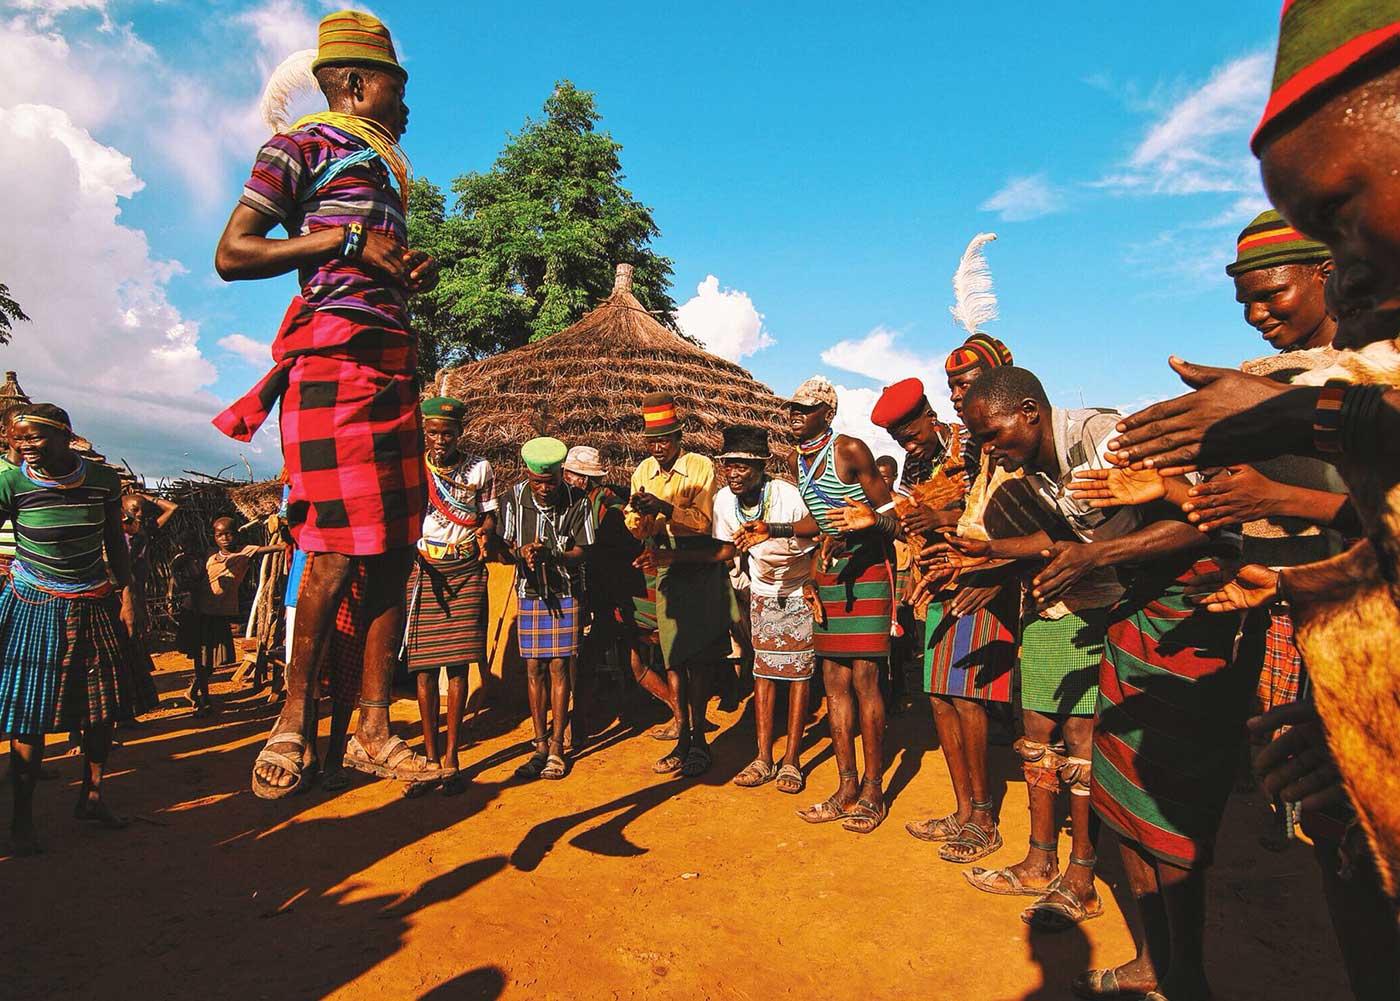 Karamoja Cultural Tour Dance Edonga Village Manyatta